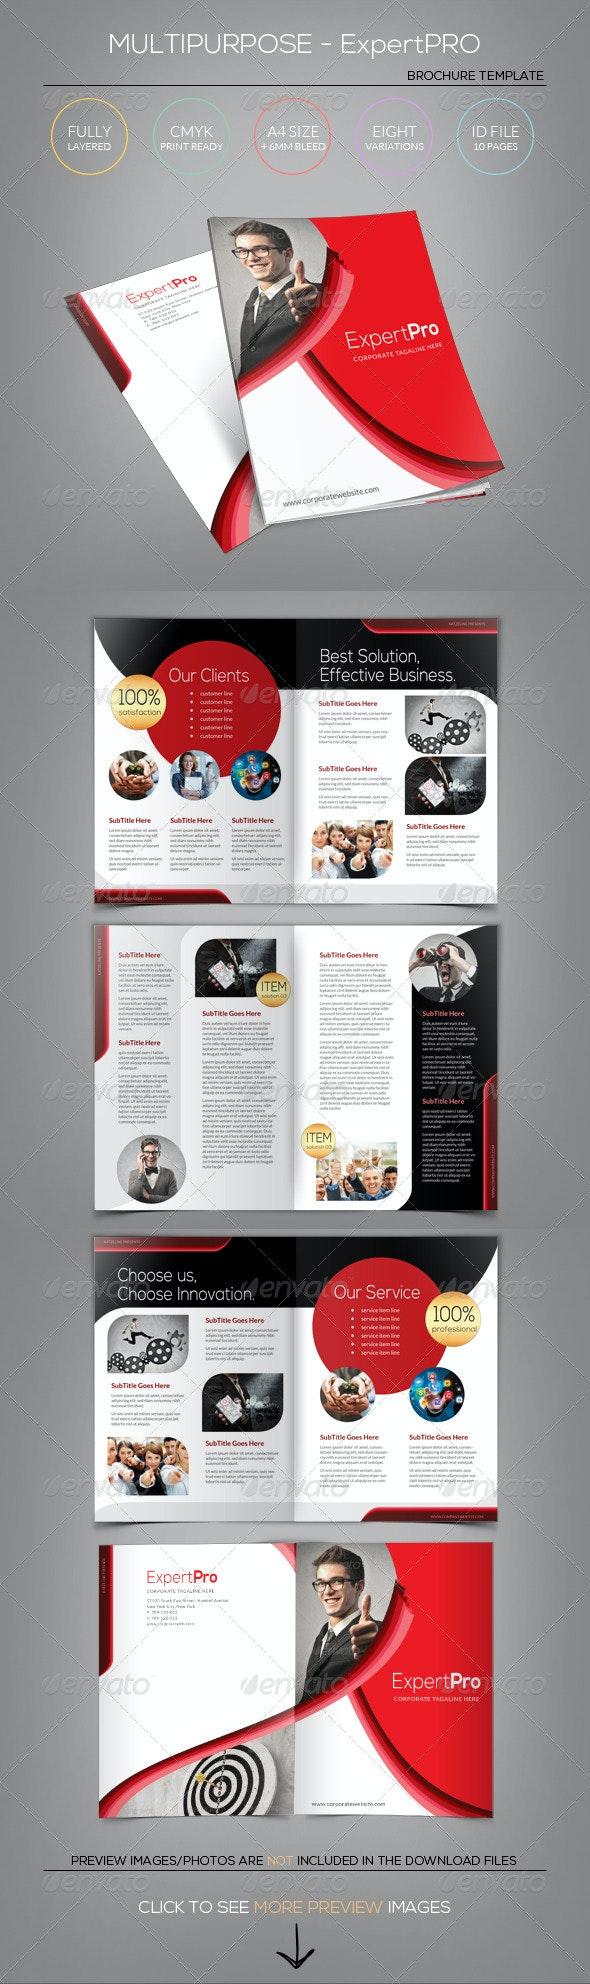 Multipurpose Brochure Template - Expert Pro - Corporate Brochures